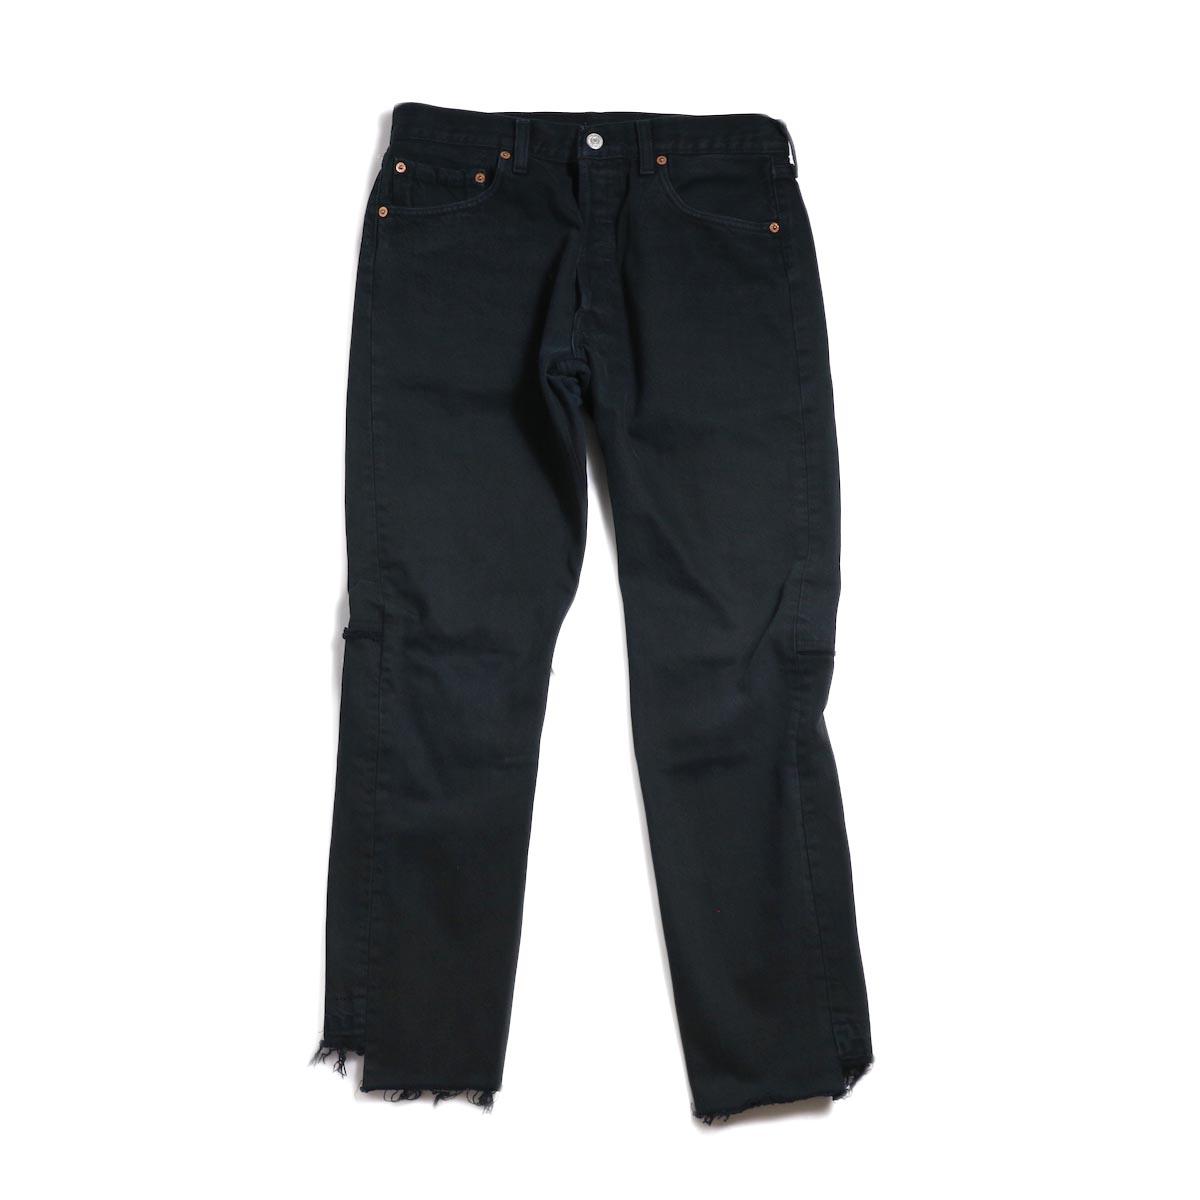 OLD PARK / Back Flare Jeans -Black Msize (E)